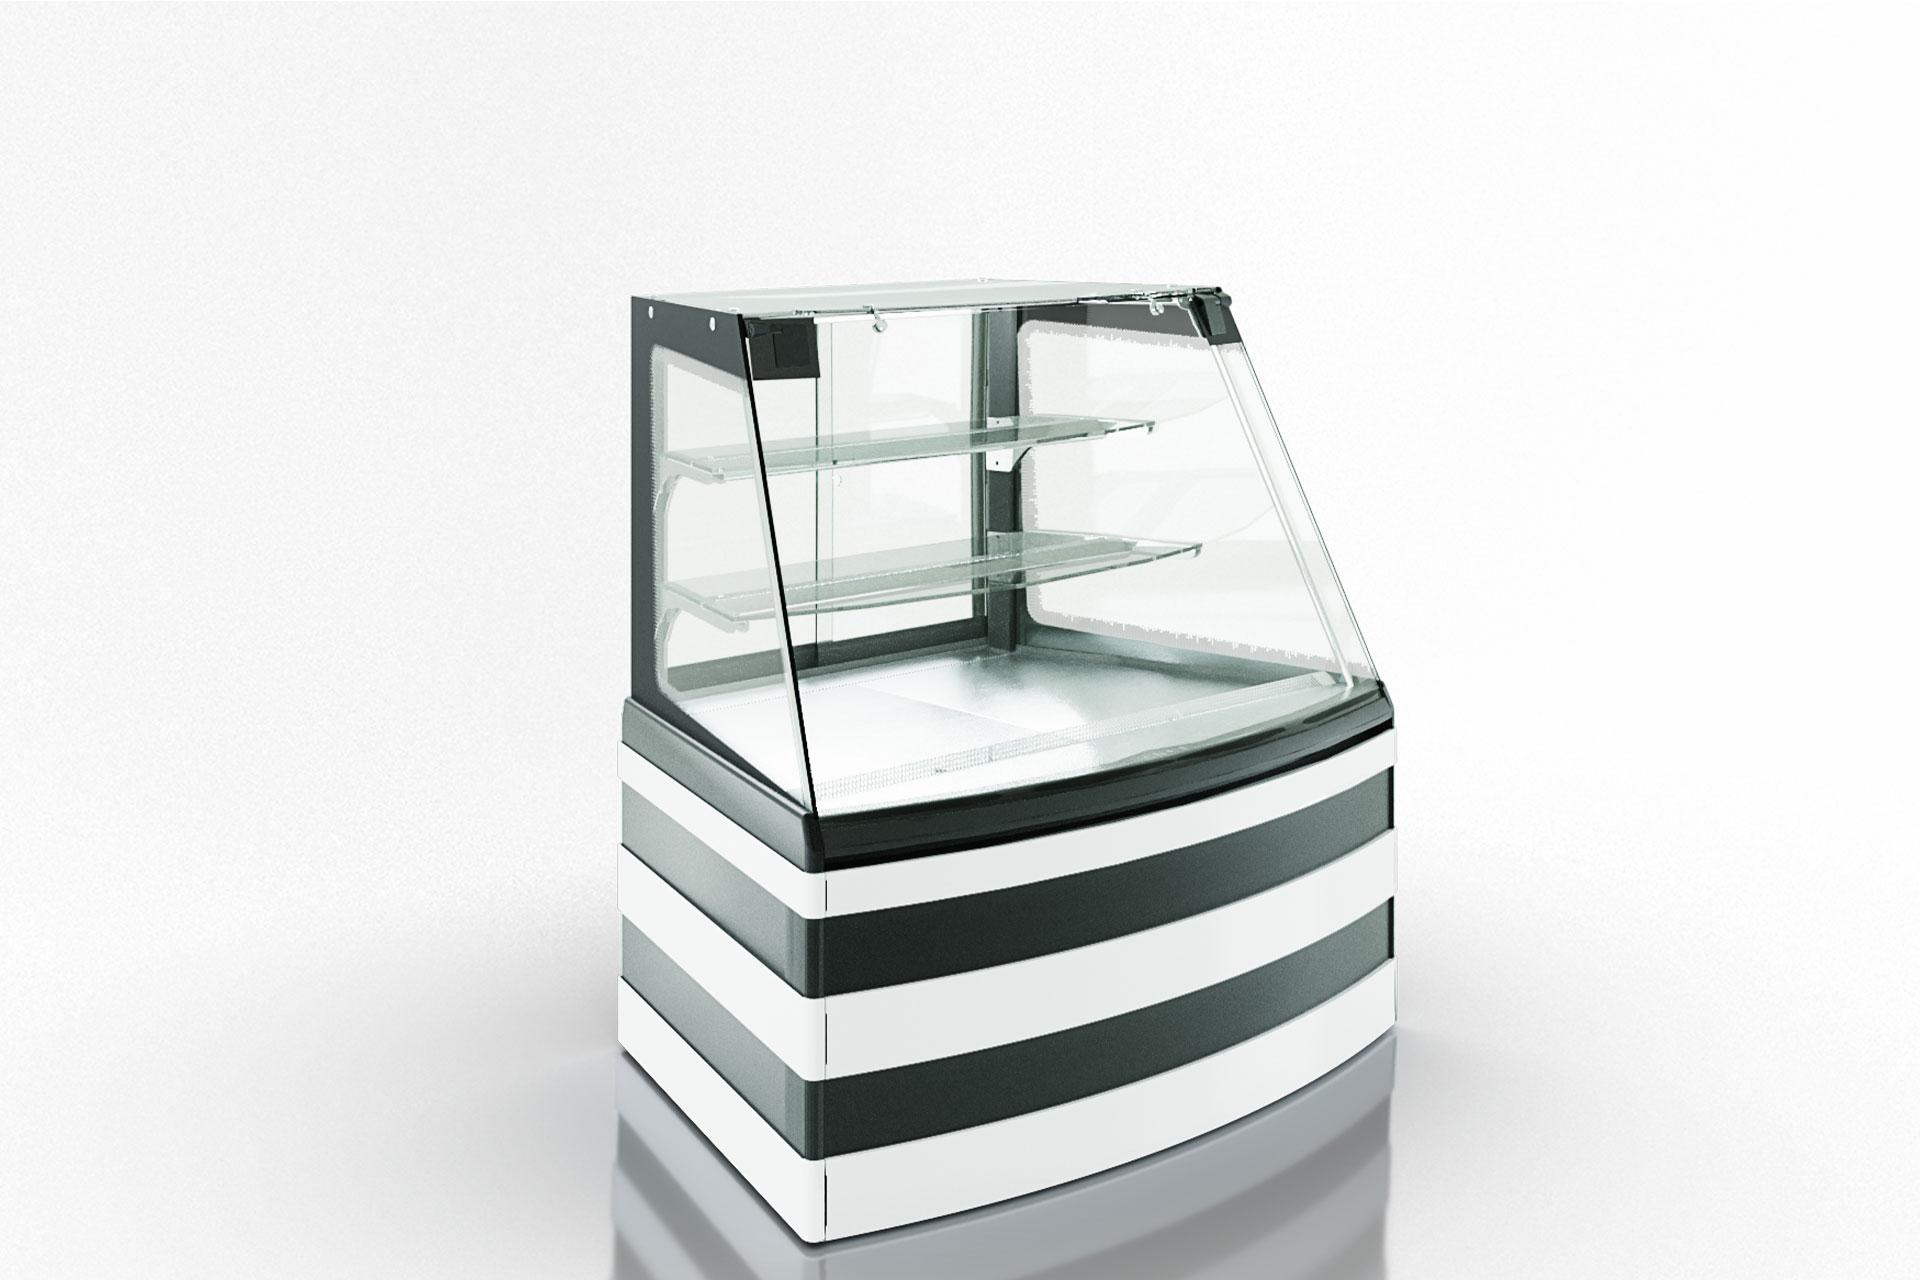 Konditorei-Vitrinen Dakota sapphire KA 090 patisserie PS 140-DLA-ER35 - Winkelelement - option